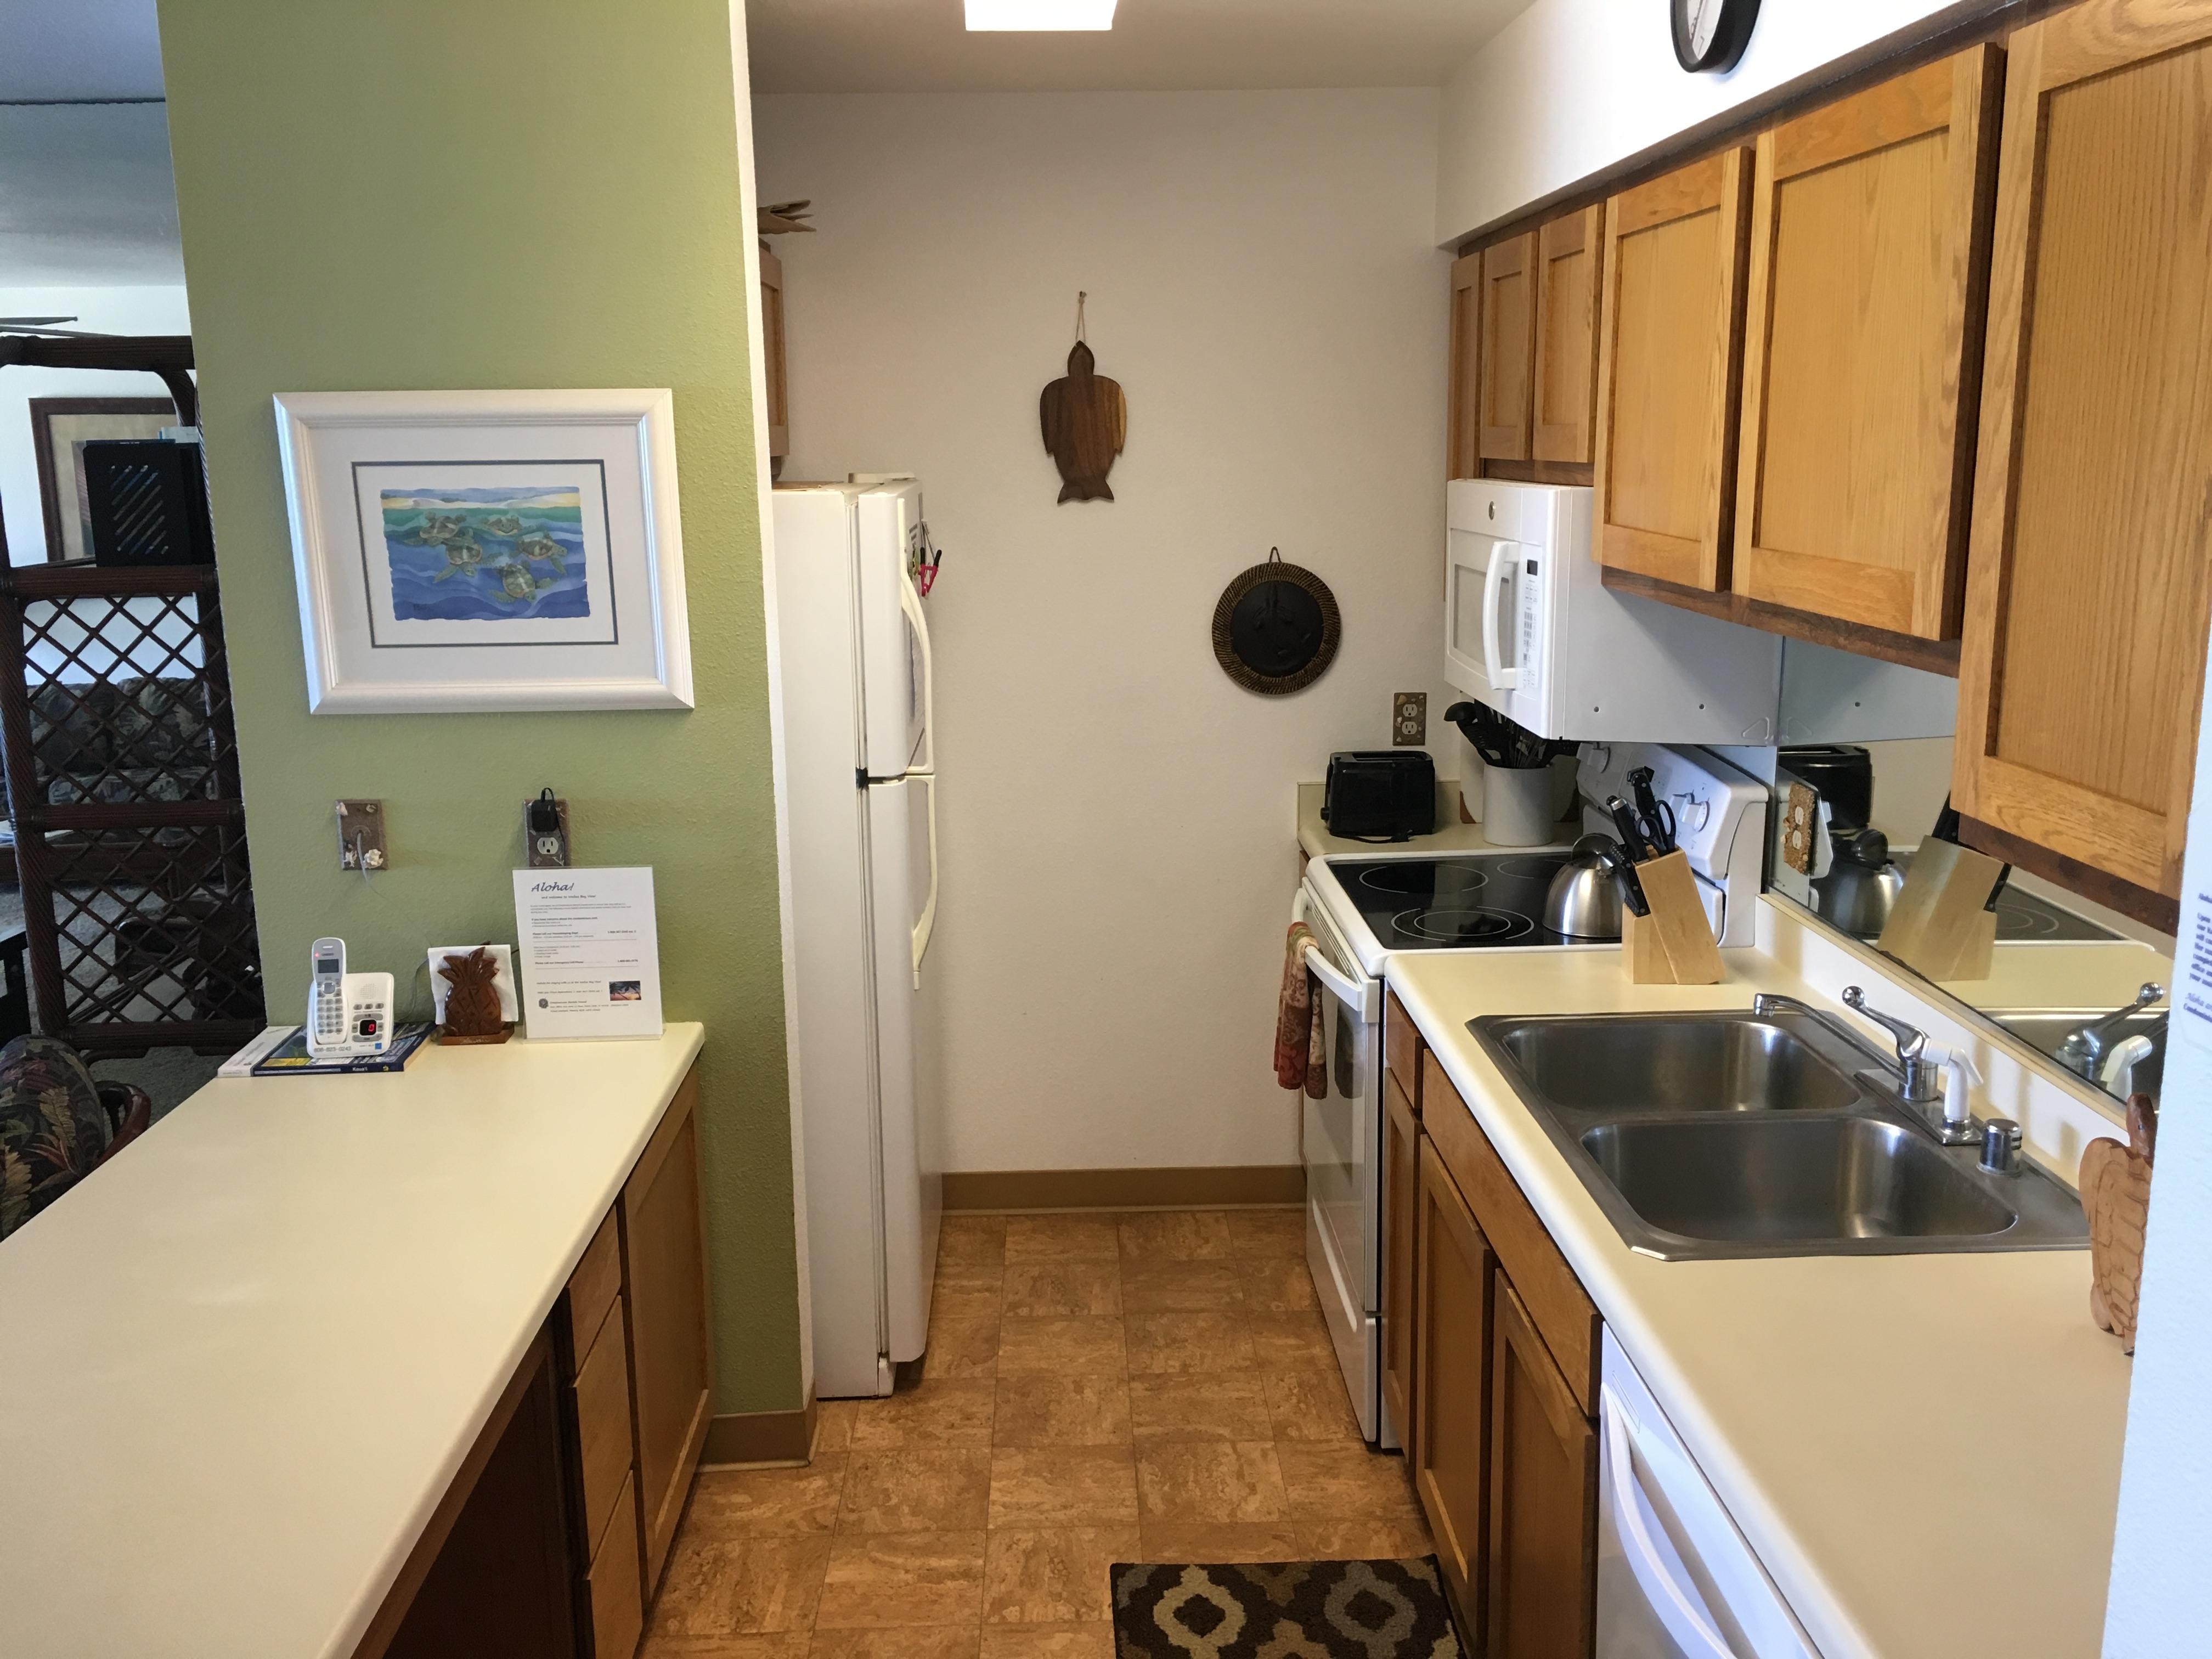 Full kitchen at Wailua Bay View condo 305